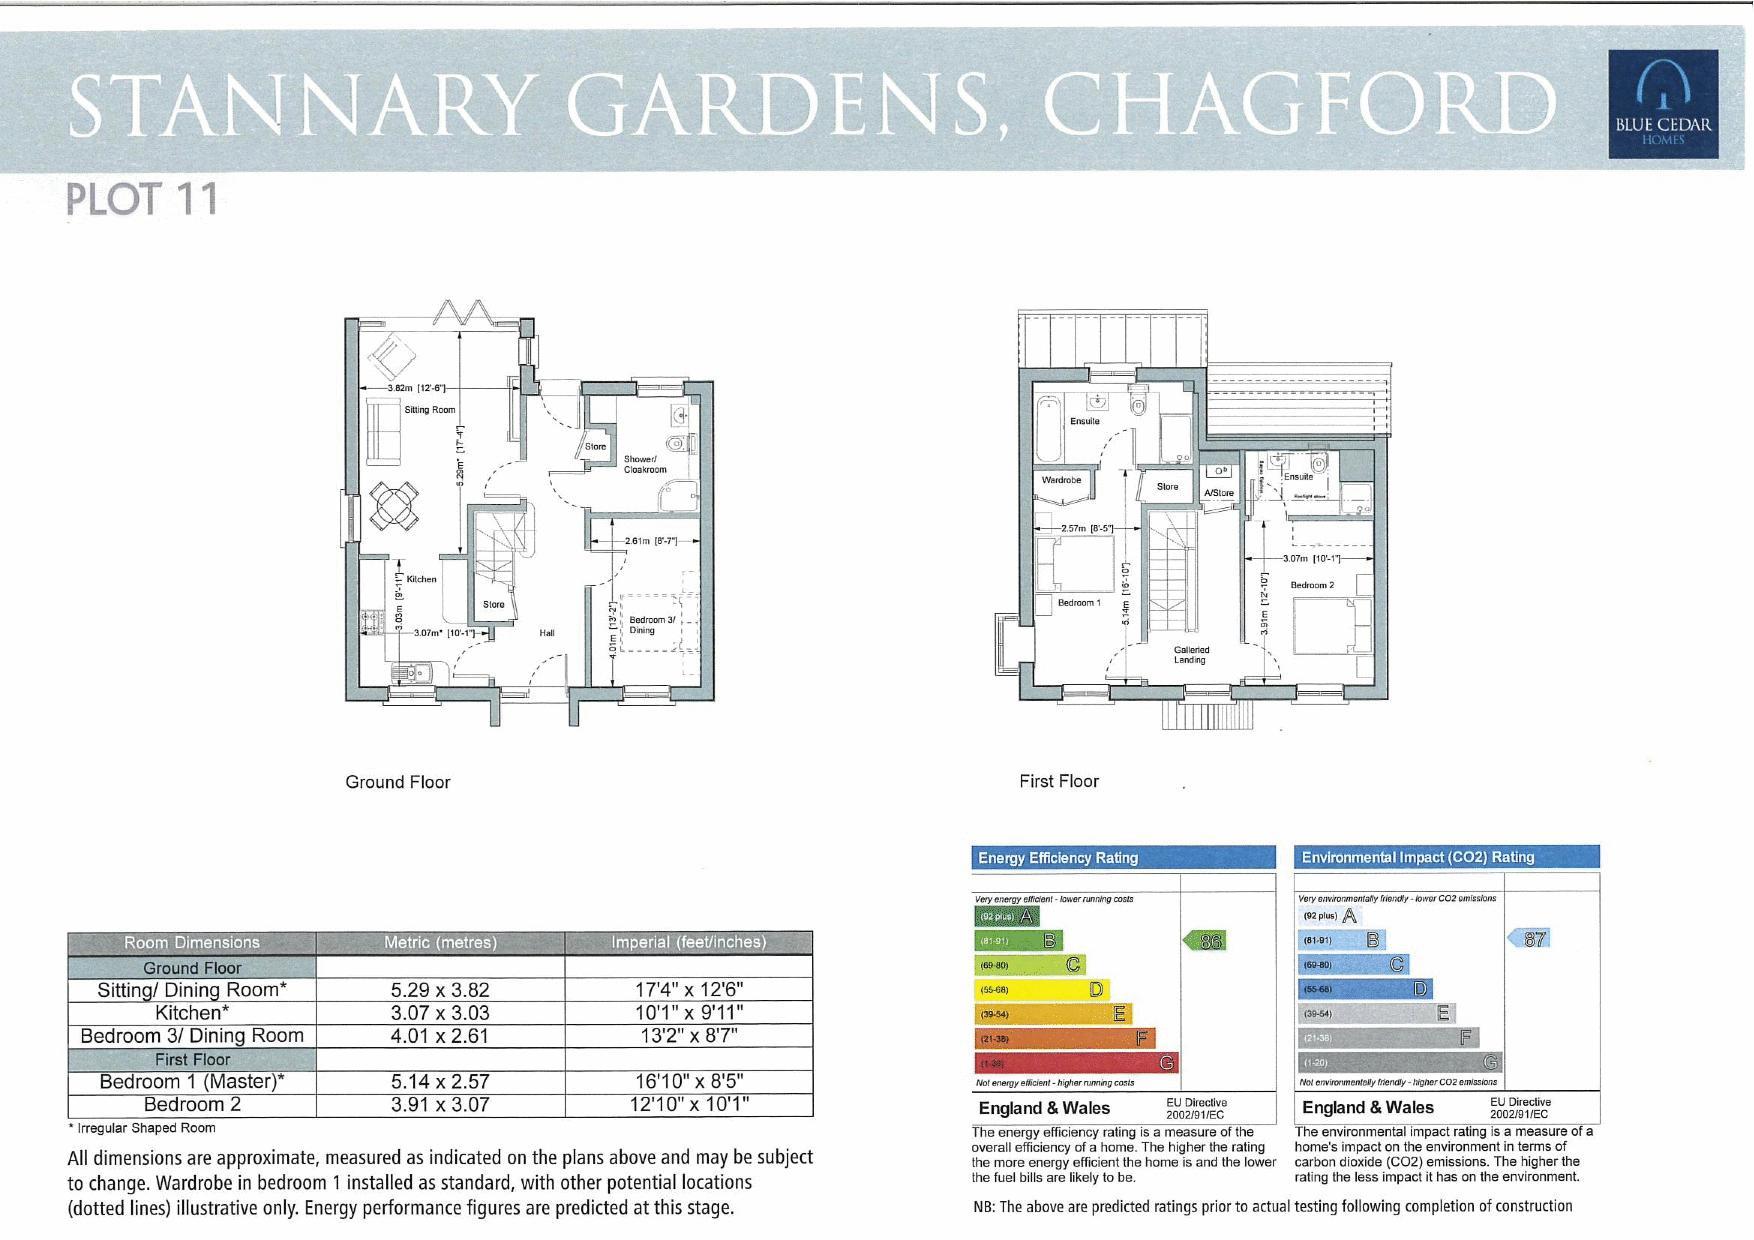 Stannary Gardens